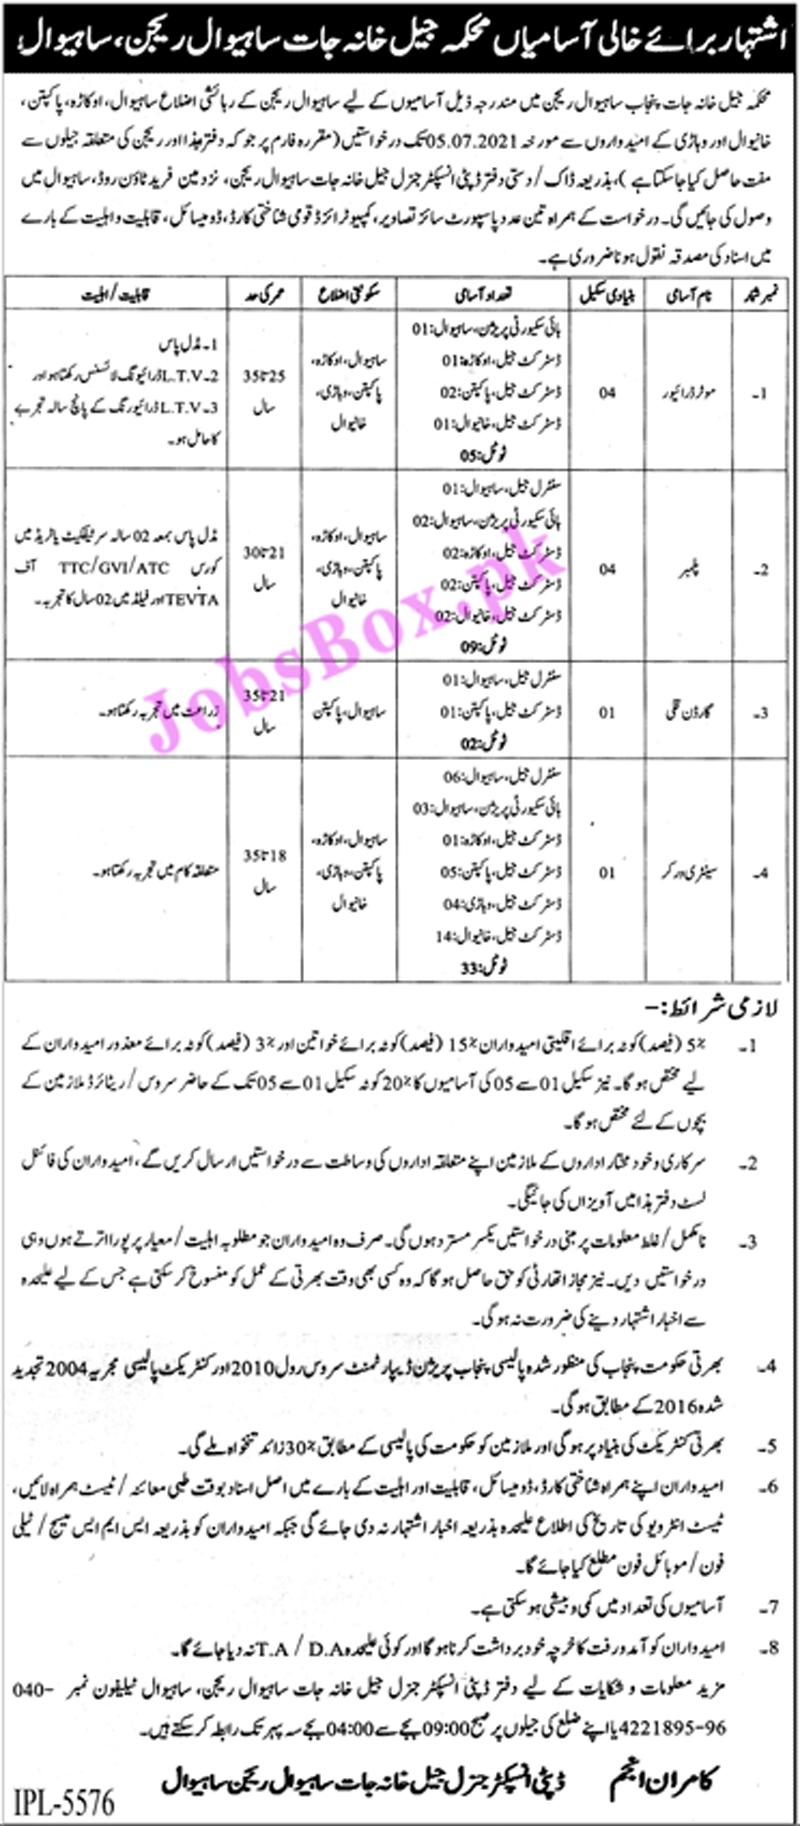 Prison Department Punjab Jobs 2021 Latest Vacancies - Jail Khana Jat Sahiwal Region Jobs 2021 Latest Advertisement